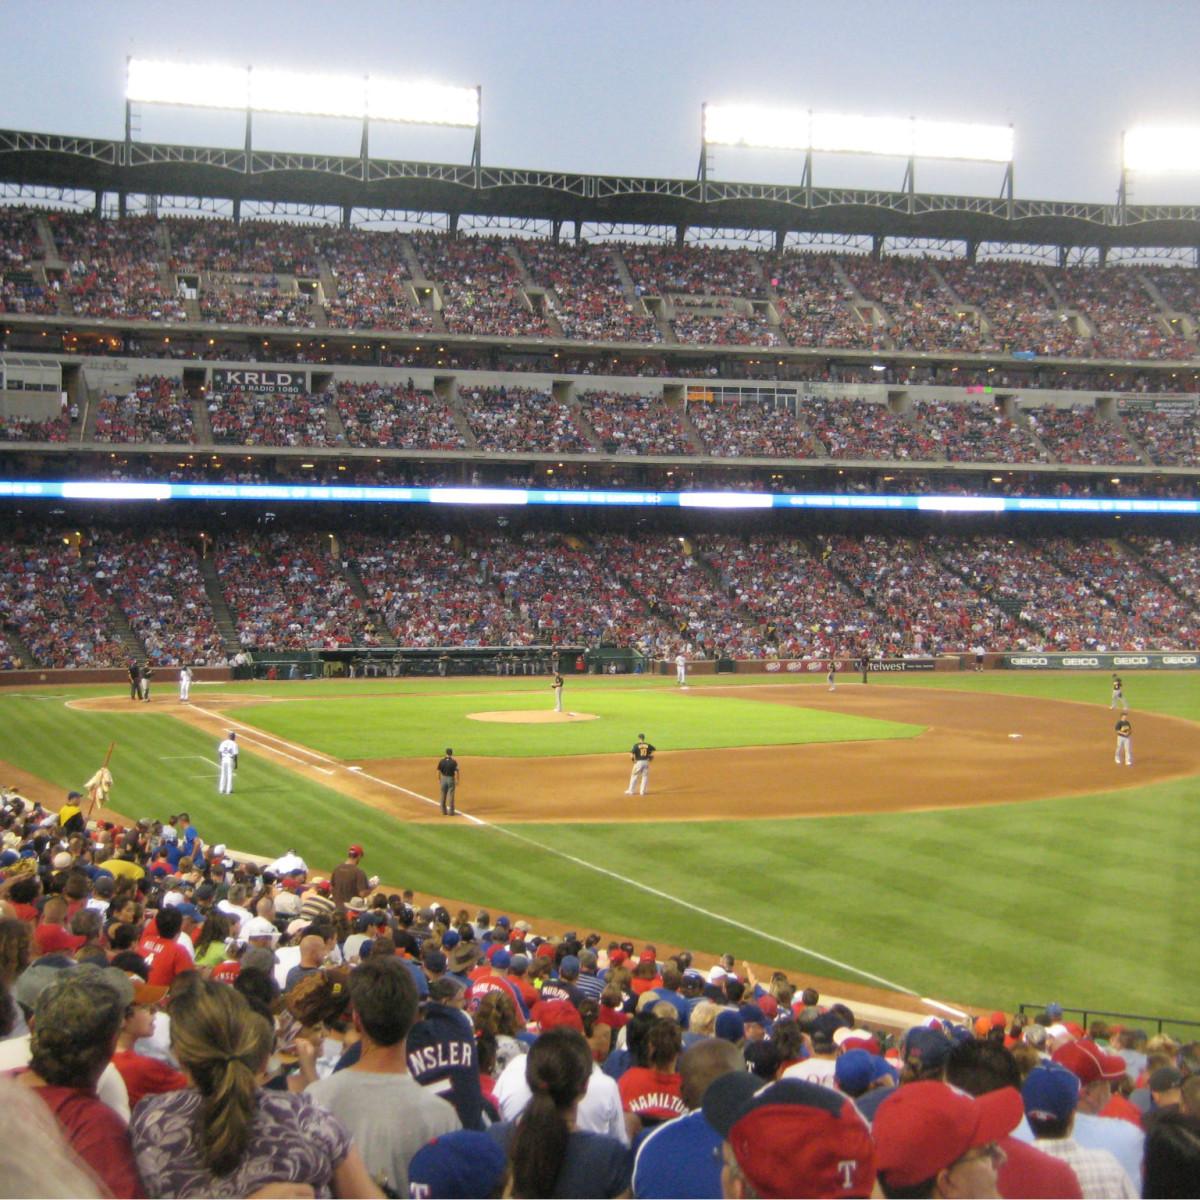 Interior of Rangers Ballpark in Arlington